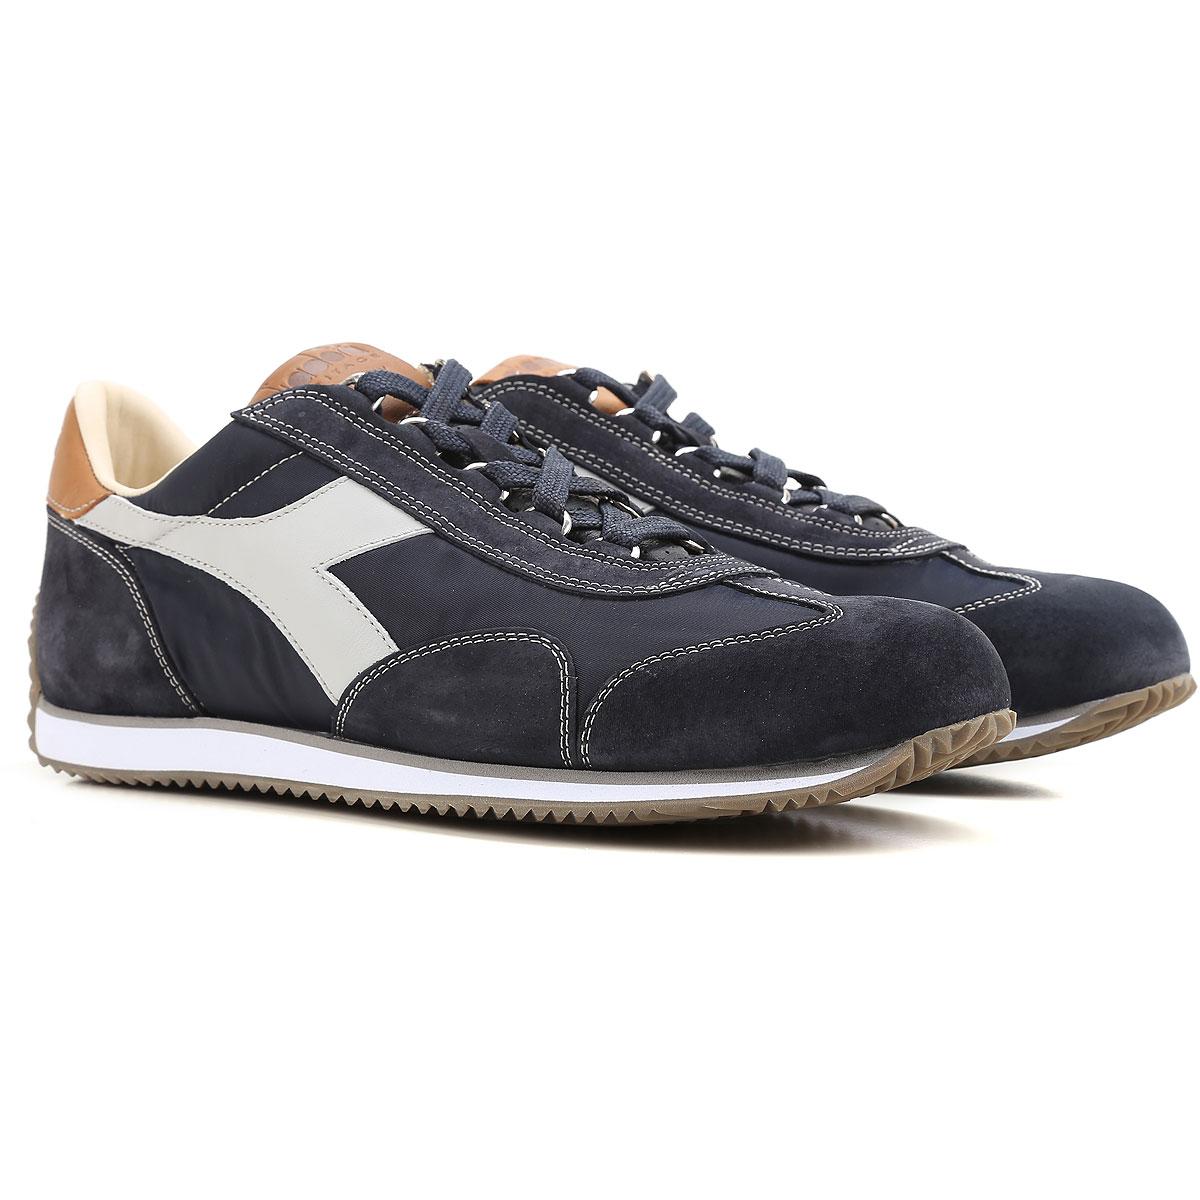 Mens Shoes Diadora. Style code: 170645-60117-